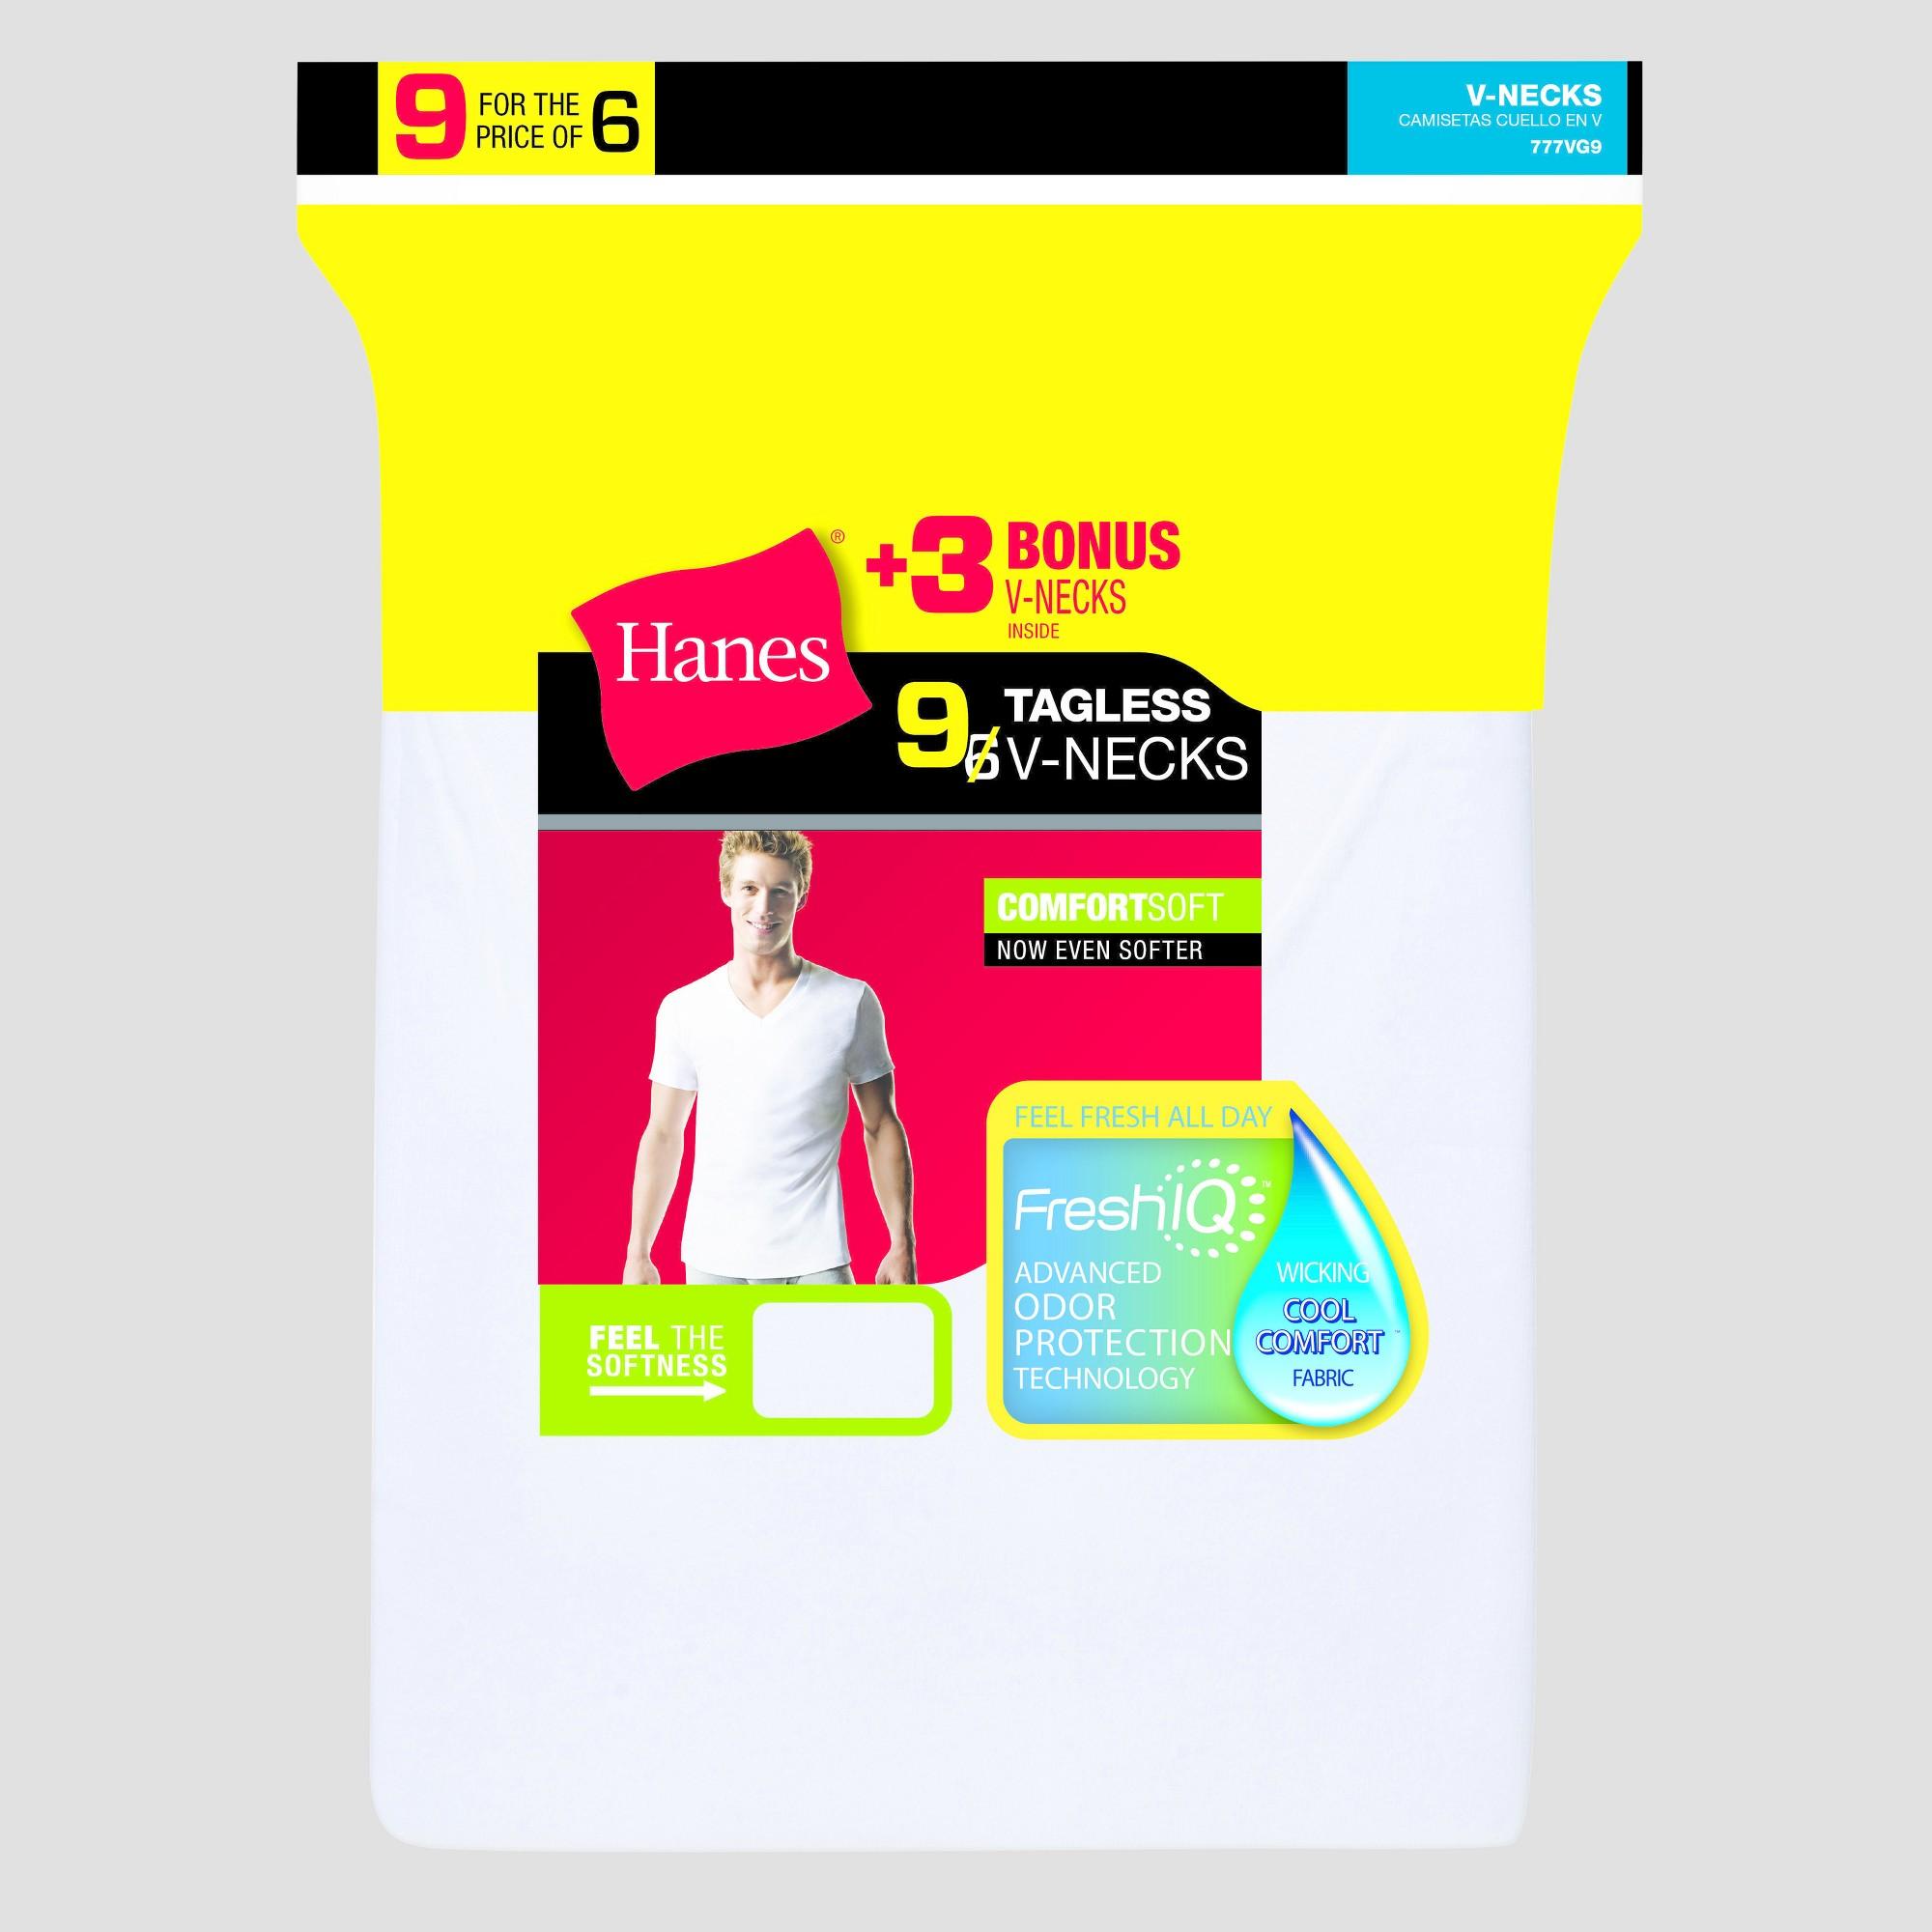 d8b029e0d5bd Hanes Men's 6pk +3 Free V-Neck Undershirts - White XL | Products ...